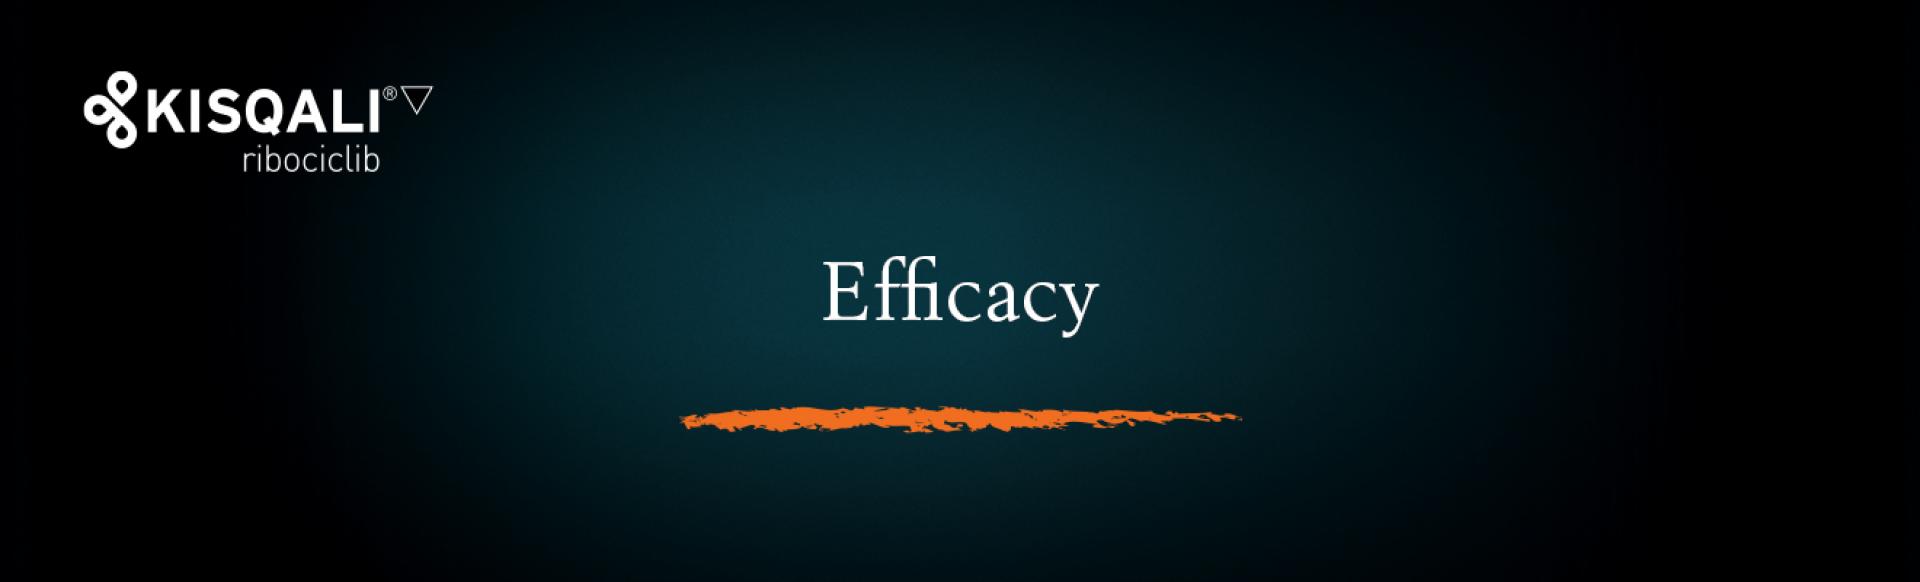 Top banner. Efficacy